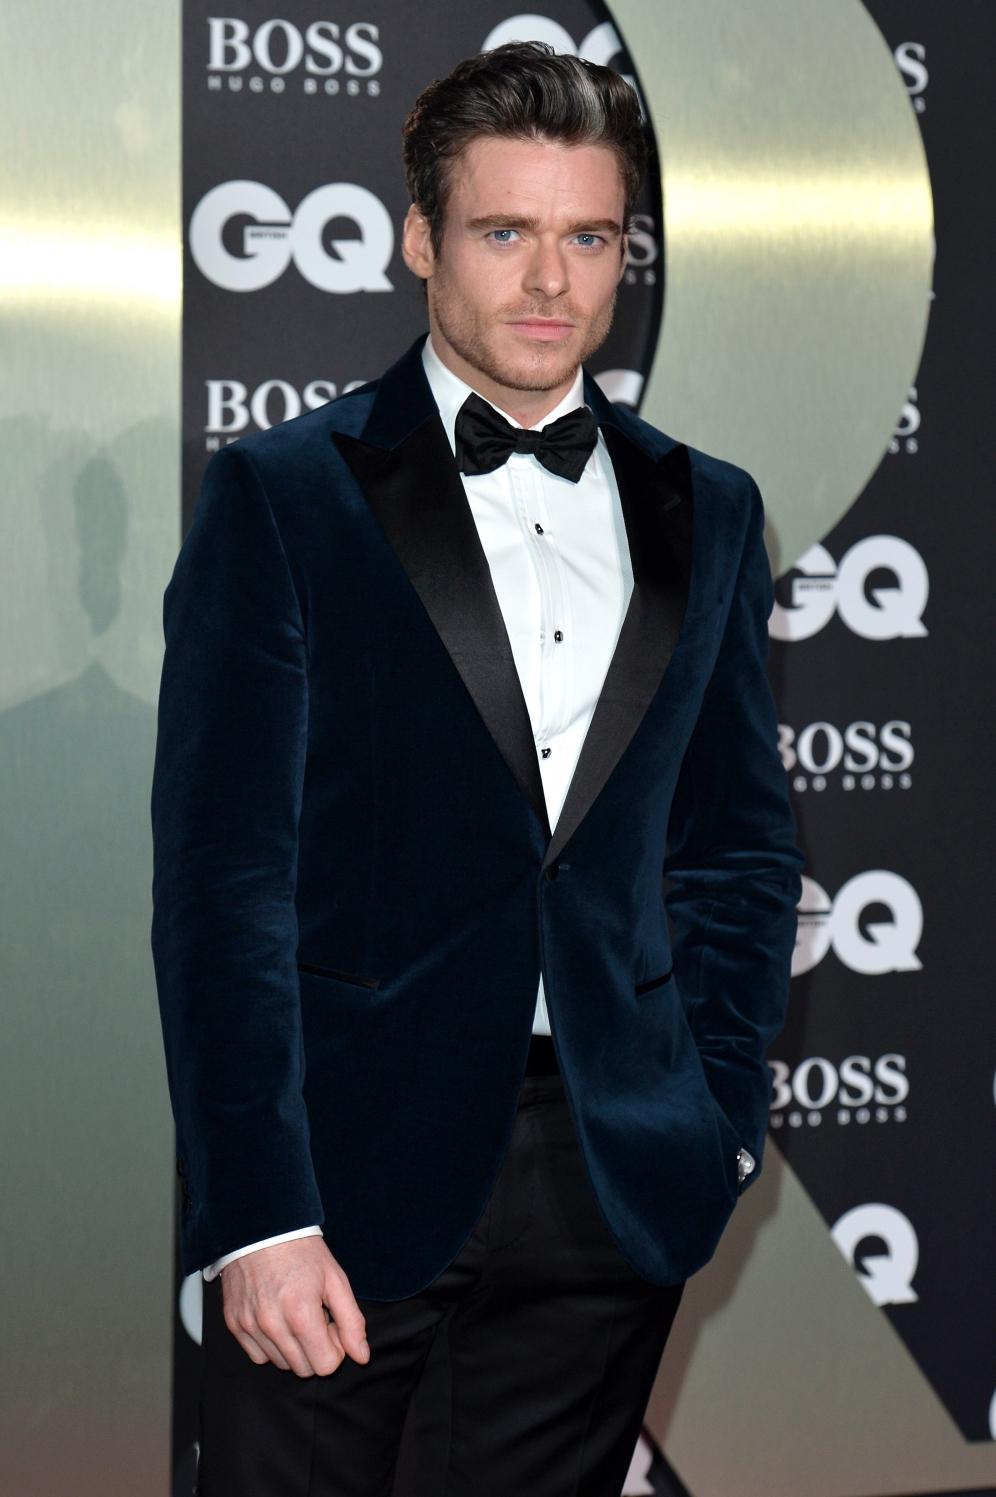 Richard Madden | GQ Awards 2019